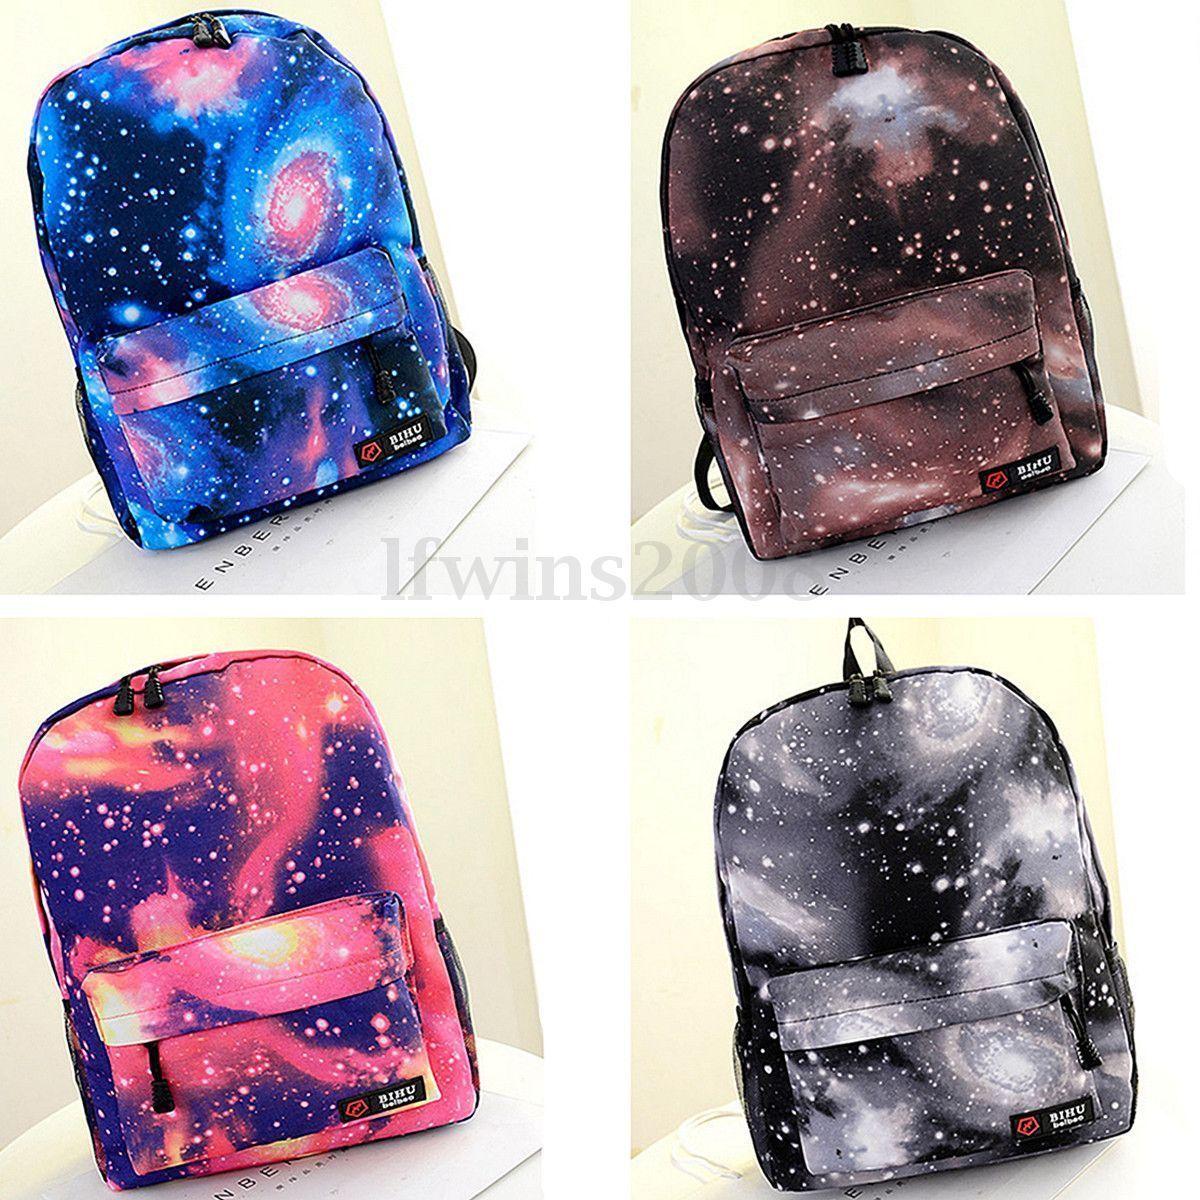 24 Estilo Mochila Bolso Bolsa Hombro para Mujers Viaje Galaxy Escolar  Backpack in Ropa e21c48cc7ed83